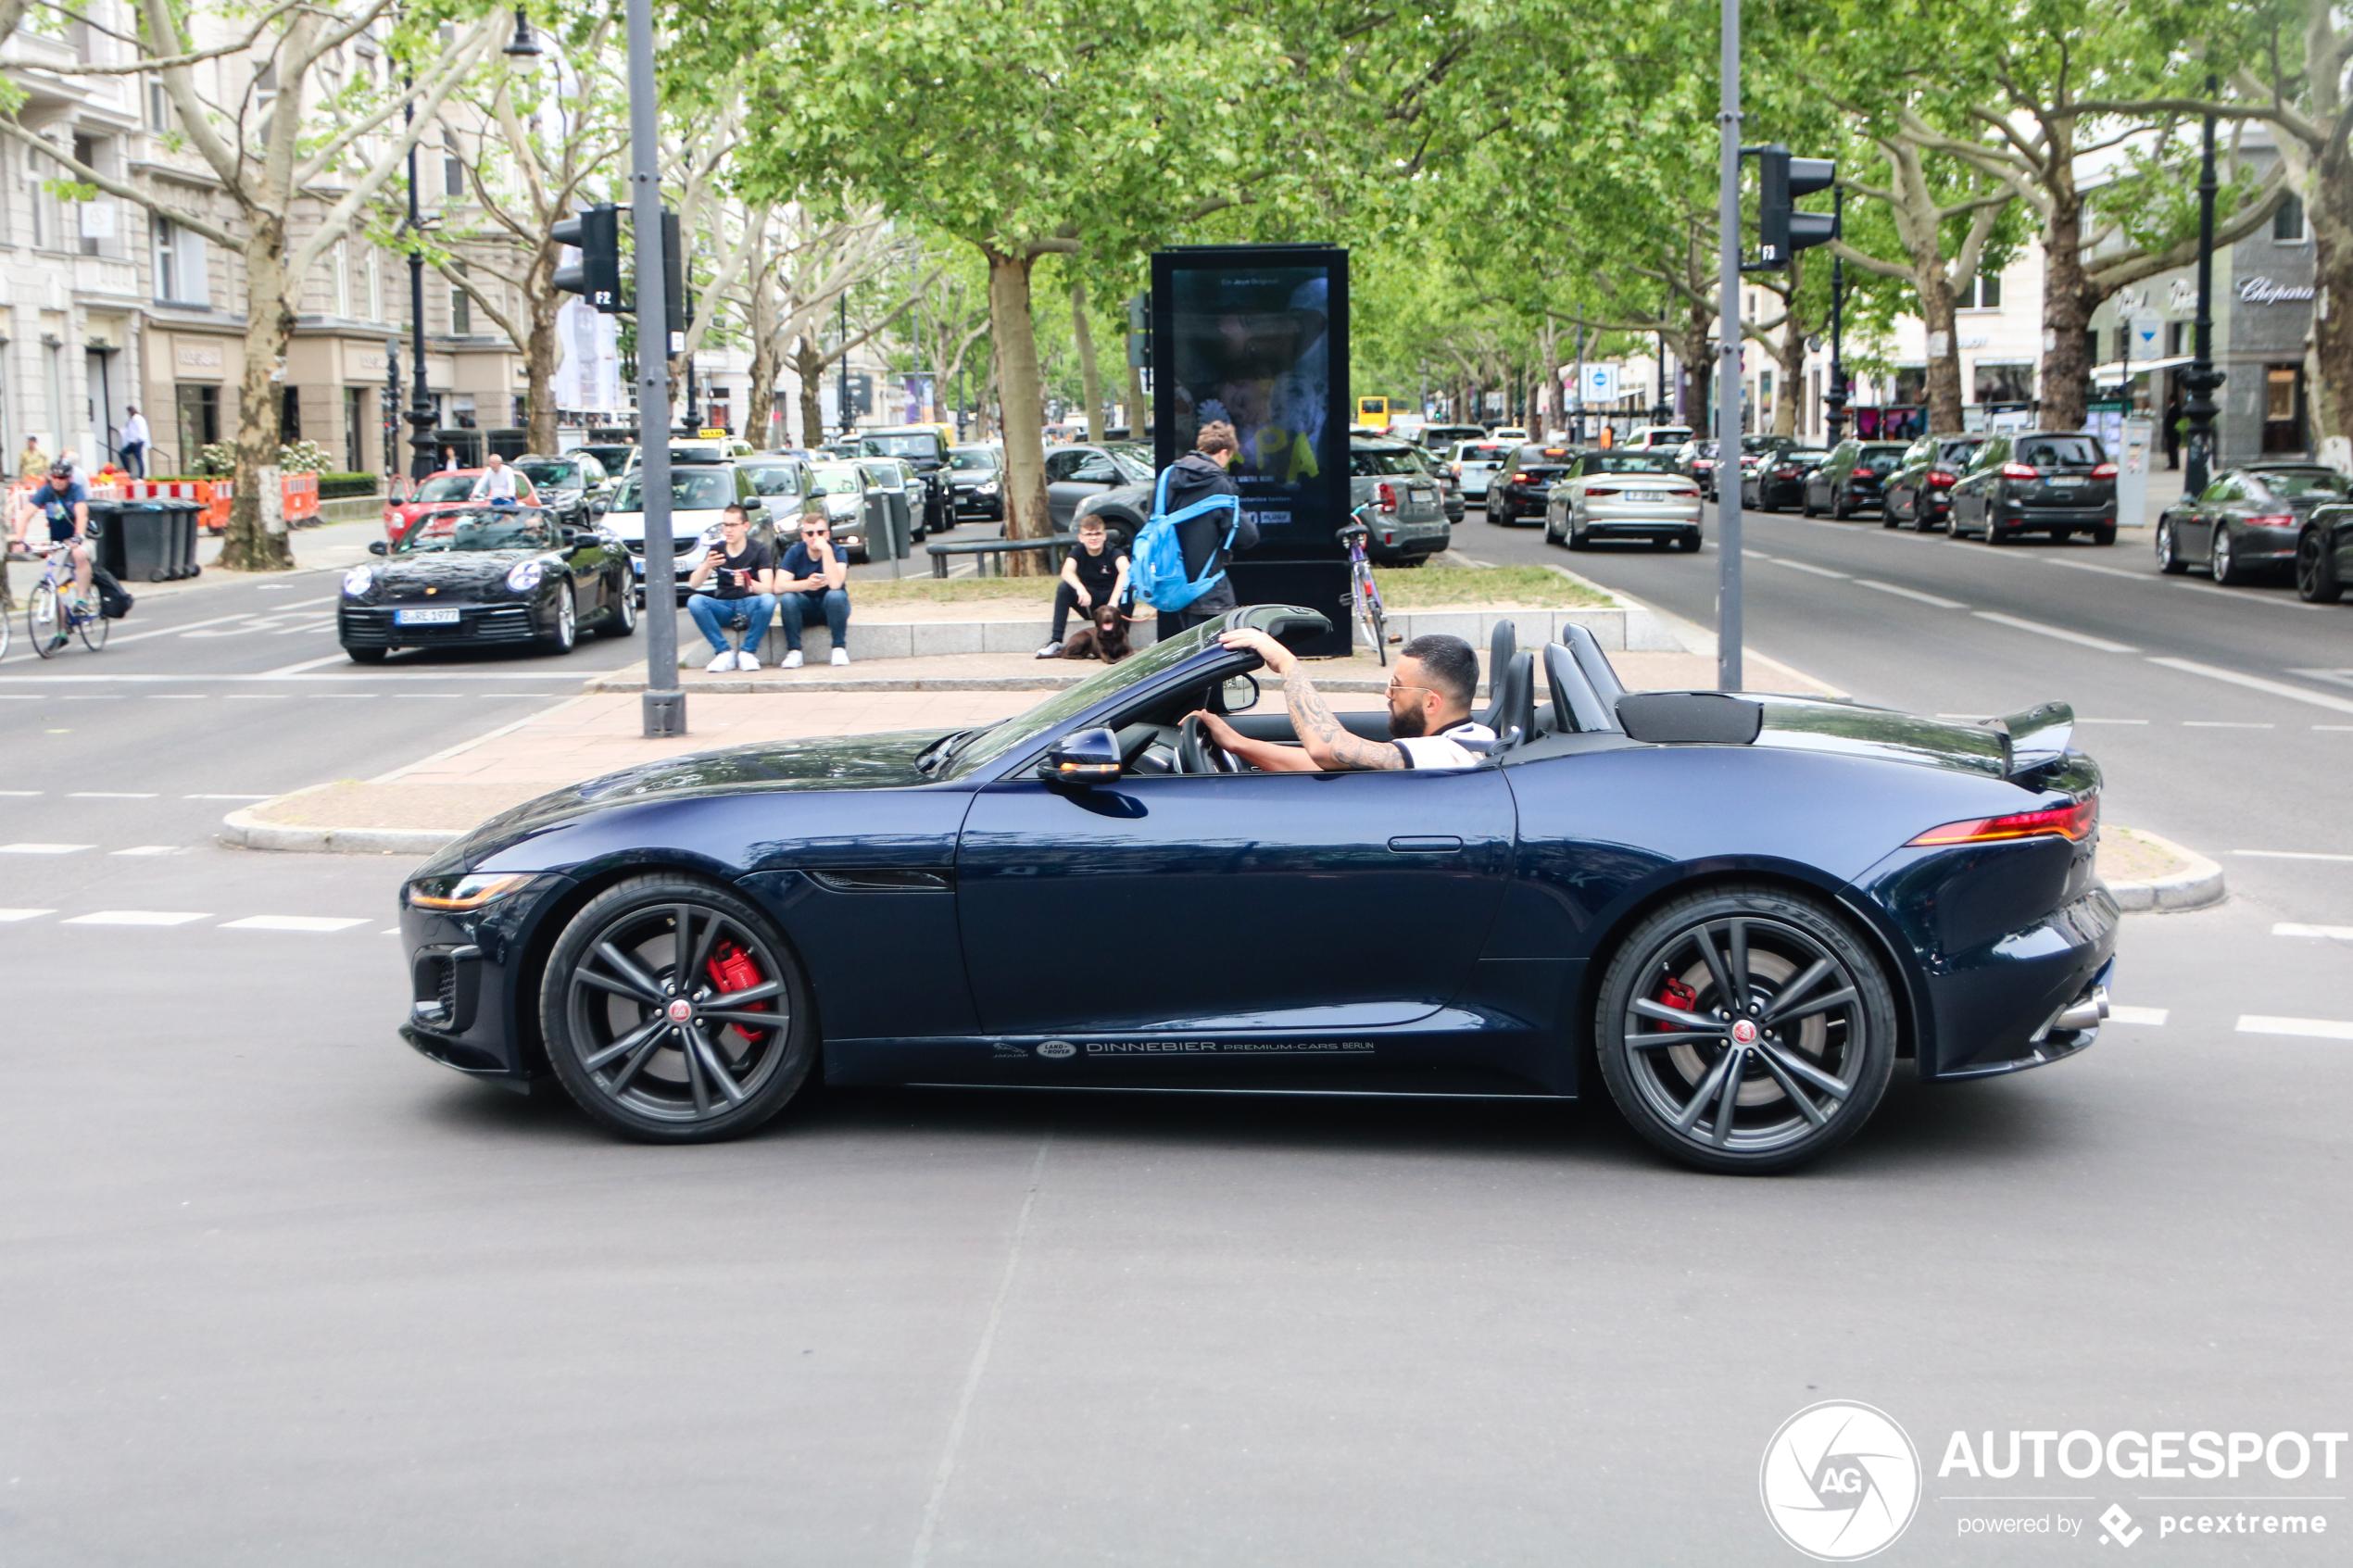 Jaguar F-TYPE R Convertible 2020 - 22 May 2020 - Autogespot